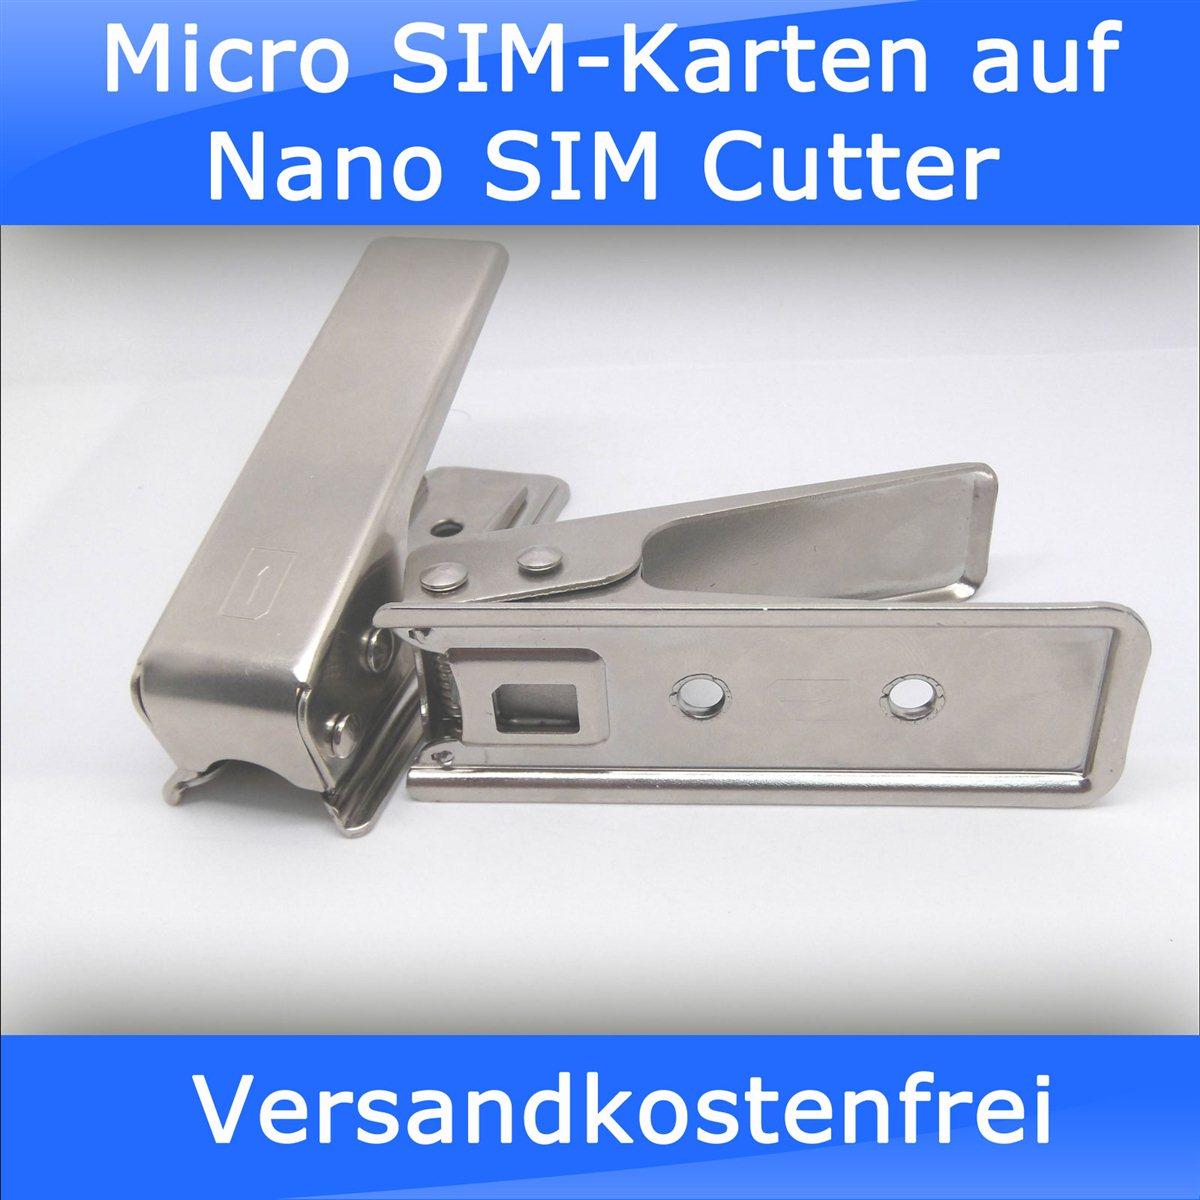 aus micro sim nano sim machen